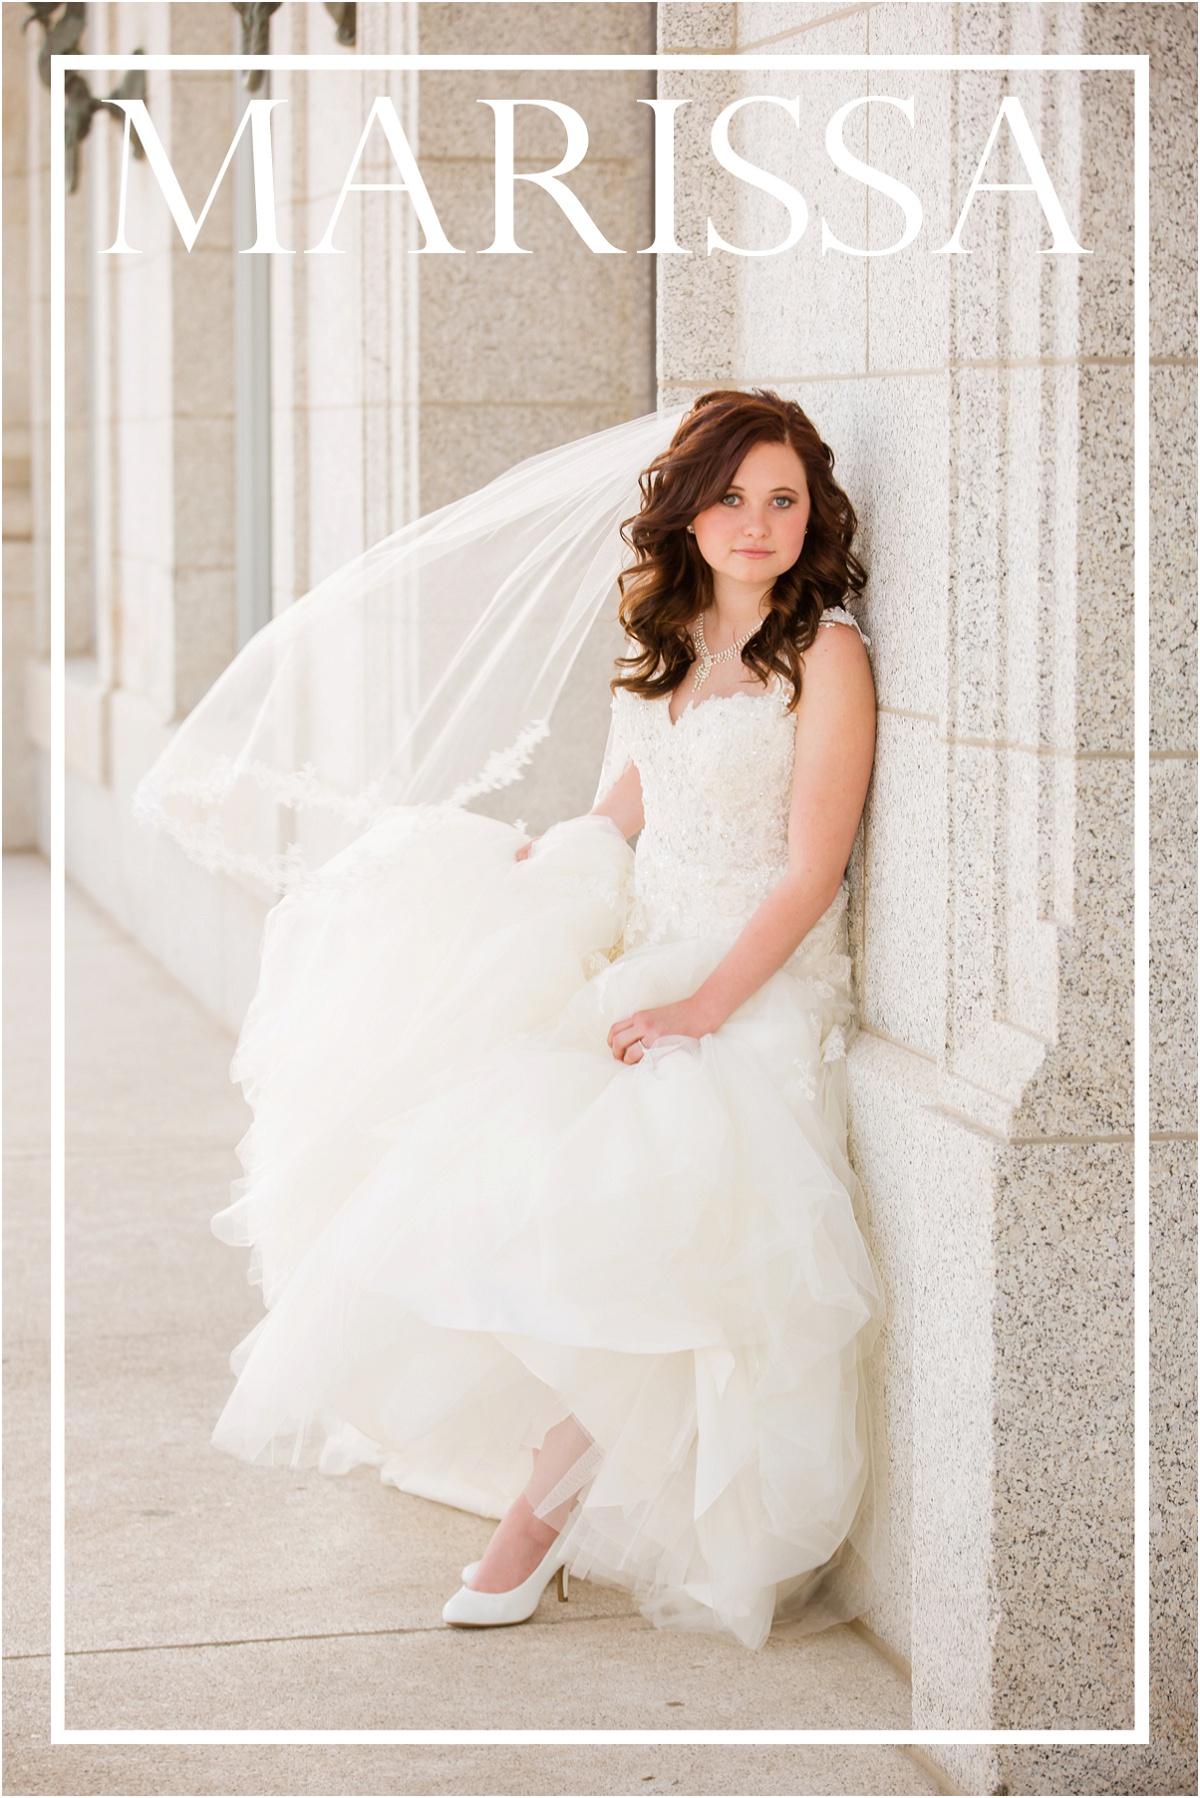 Terra Cooper Photography Weddings Brides 2015_5395.jpg